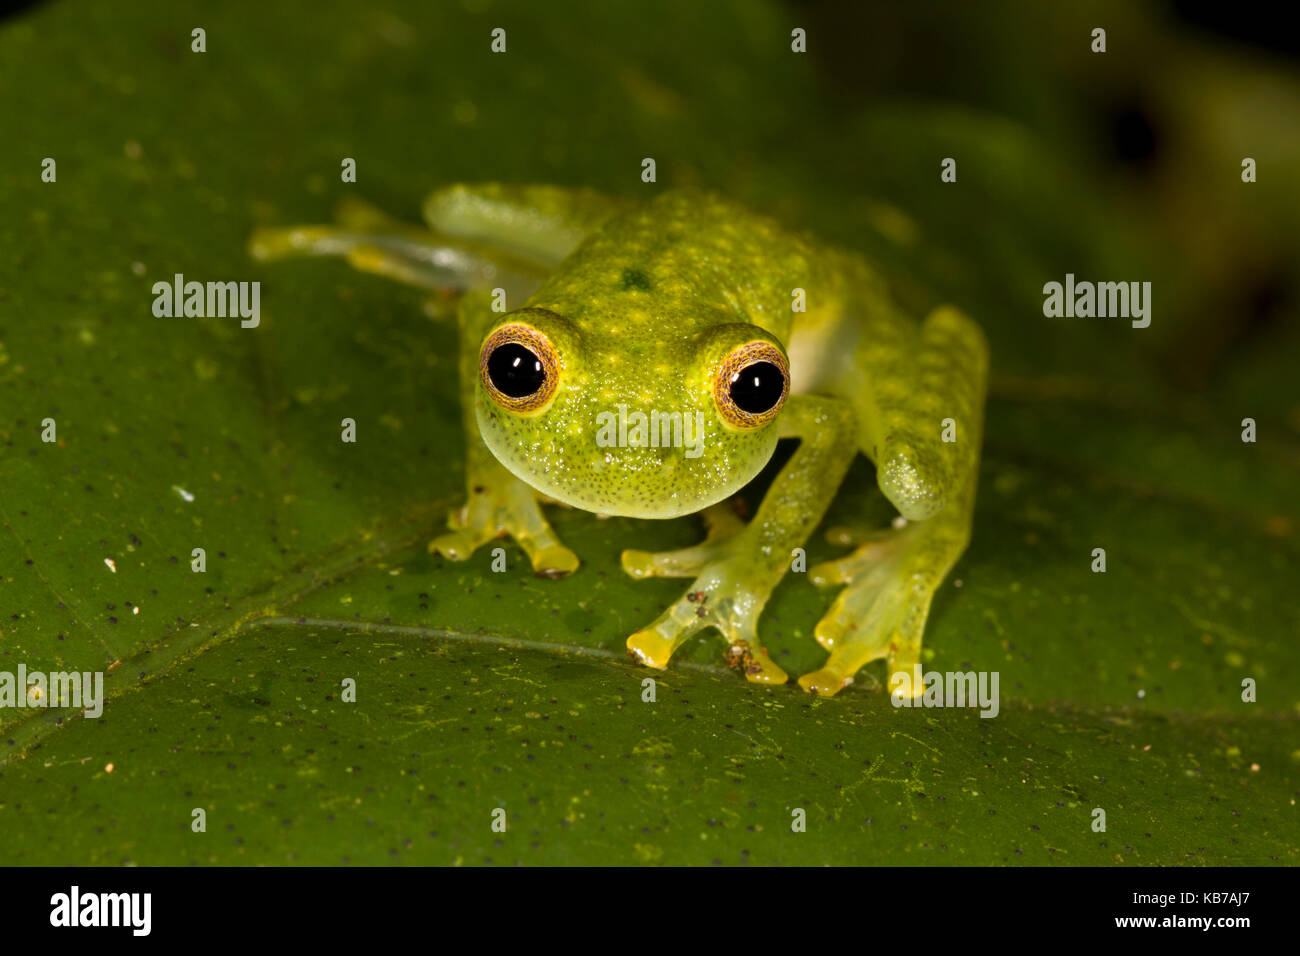 Unknown Hyalinobatrachium sp. sitting on a leaf, Ecuador, Napo, San Jose de Payamino - Stock Image